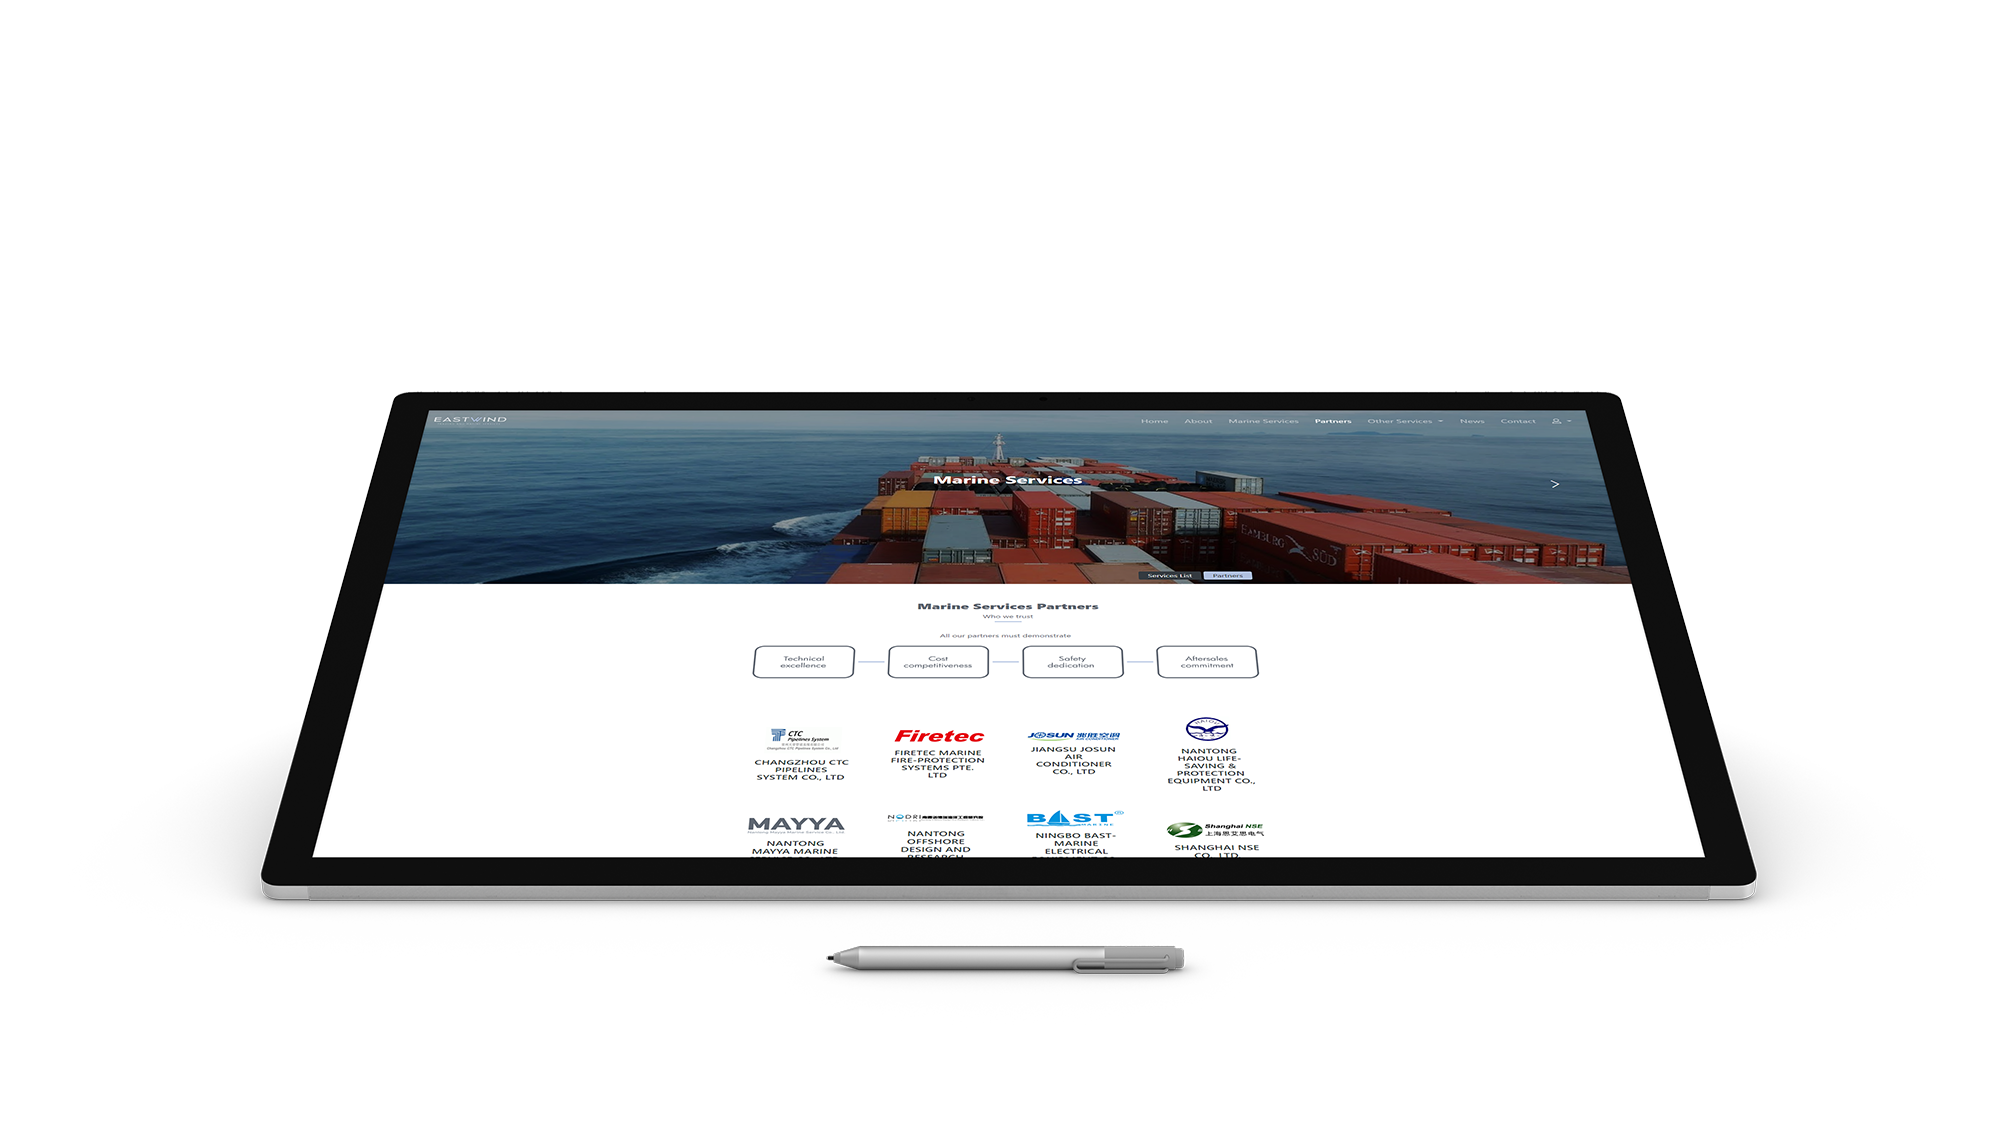 Eastwind Marine services website design